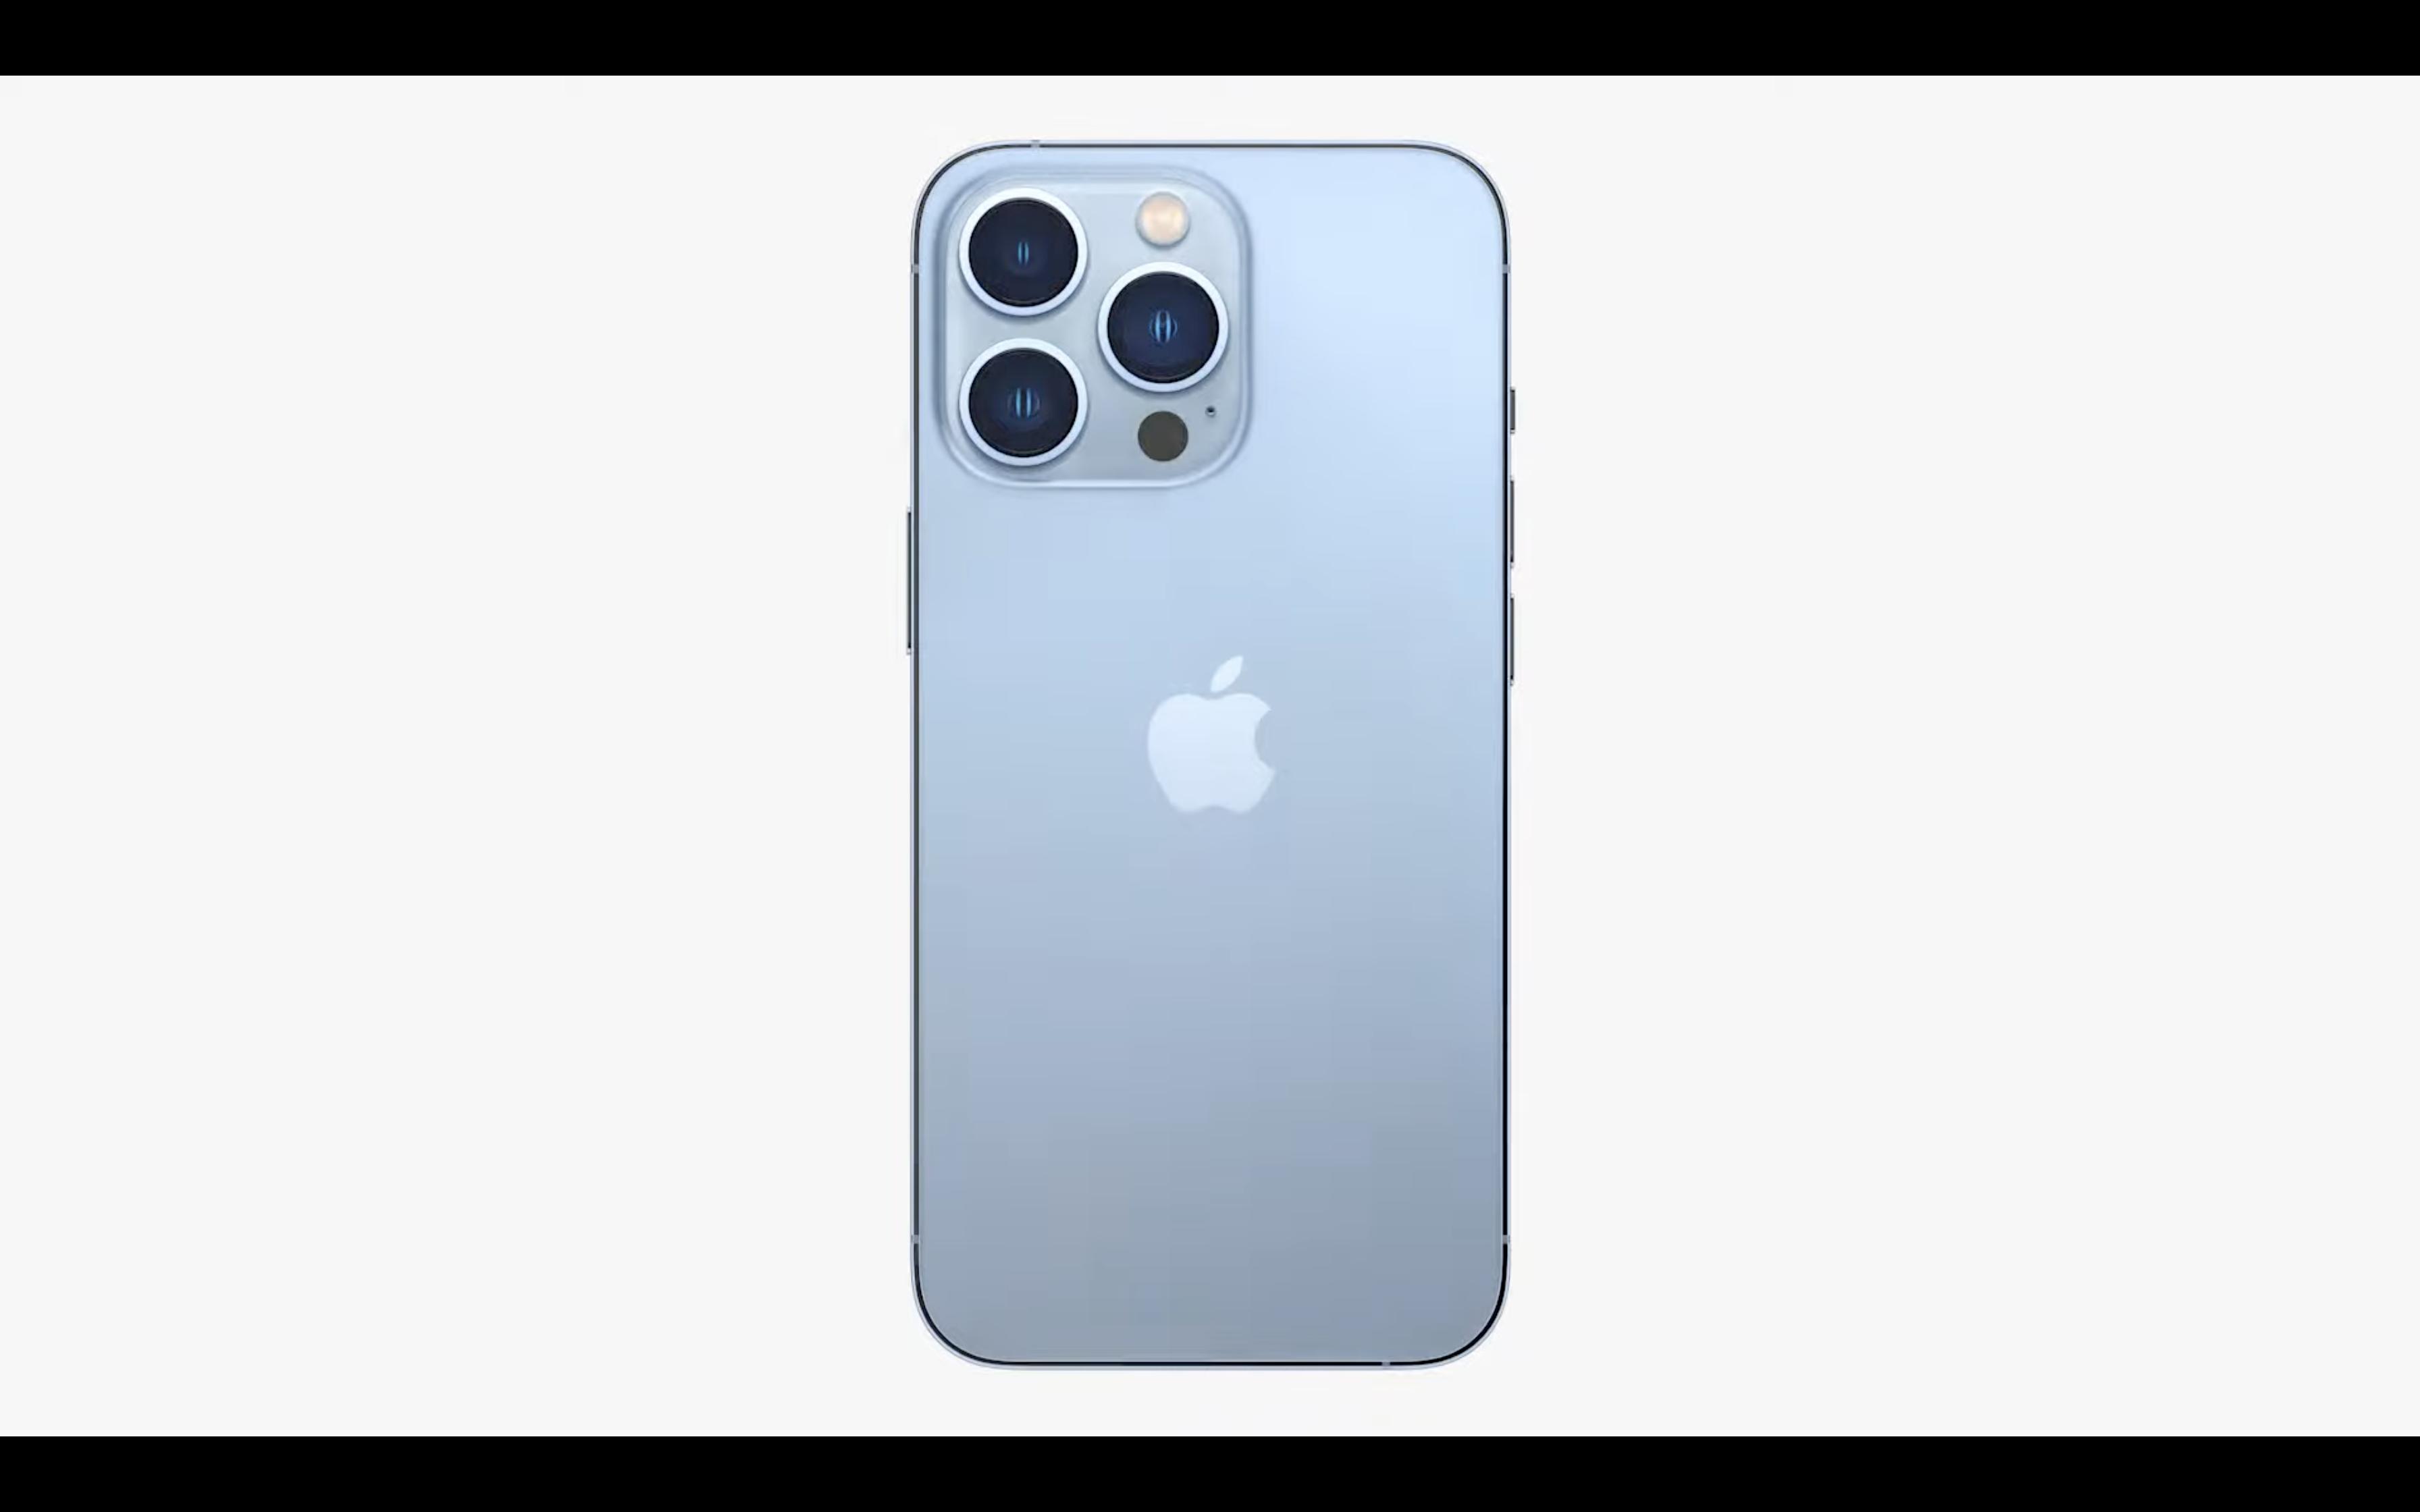 Apple iPhone 13 Pro (512GB)規格、價錢與介紹 - ePrice.HK 流動版-0